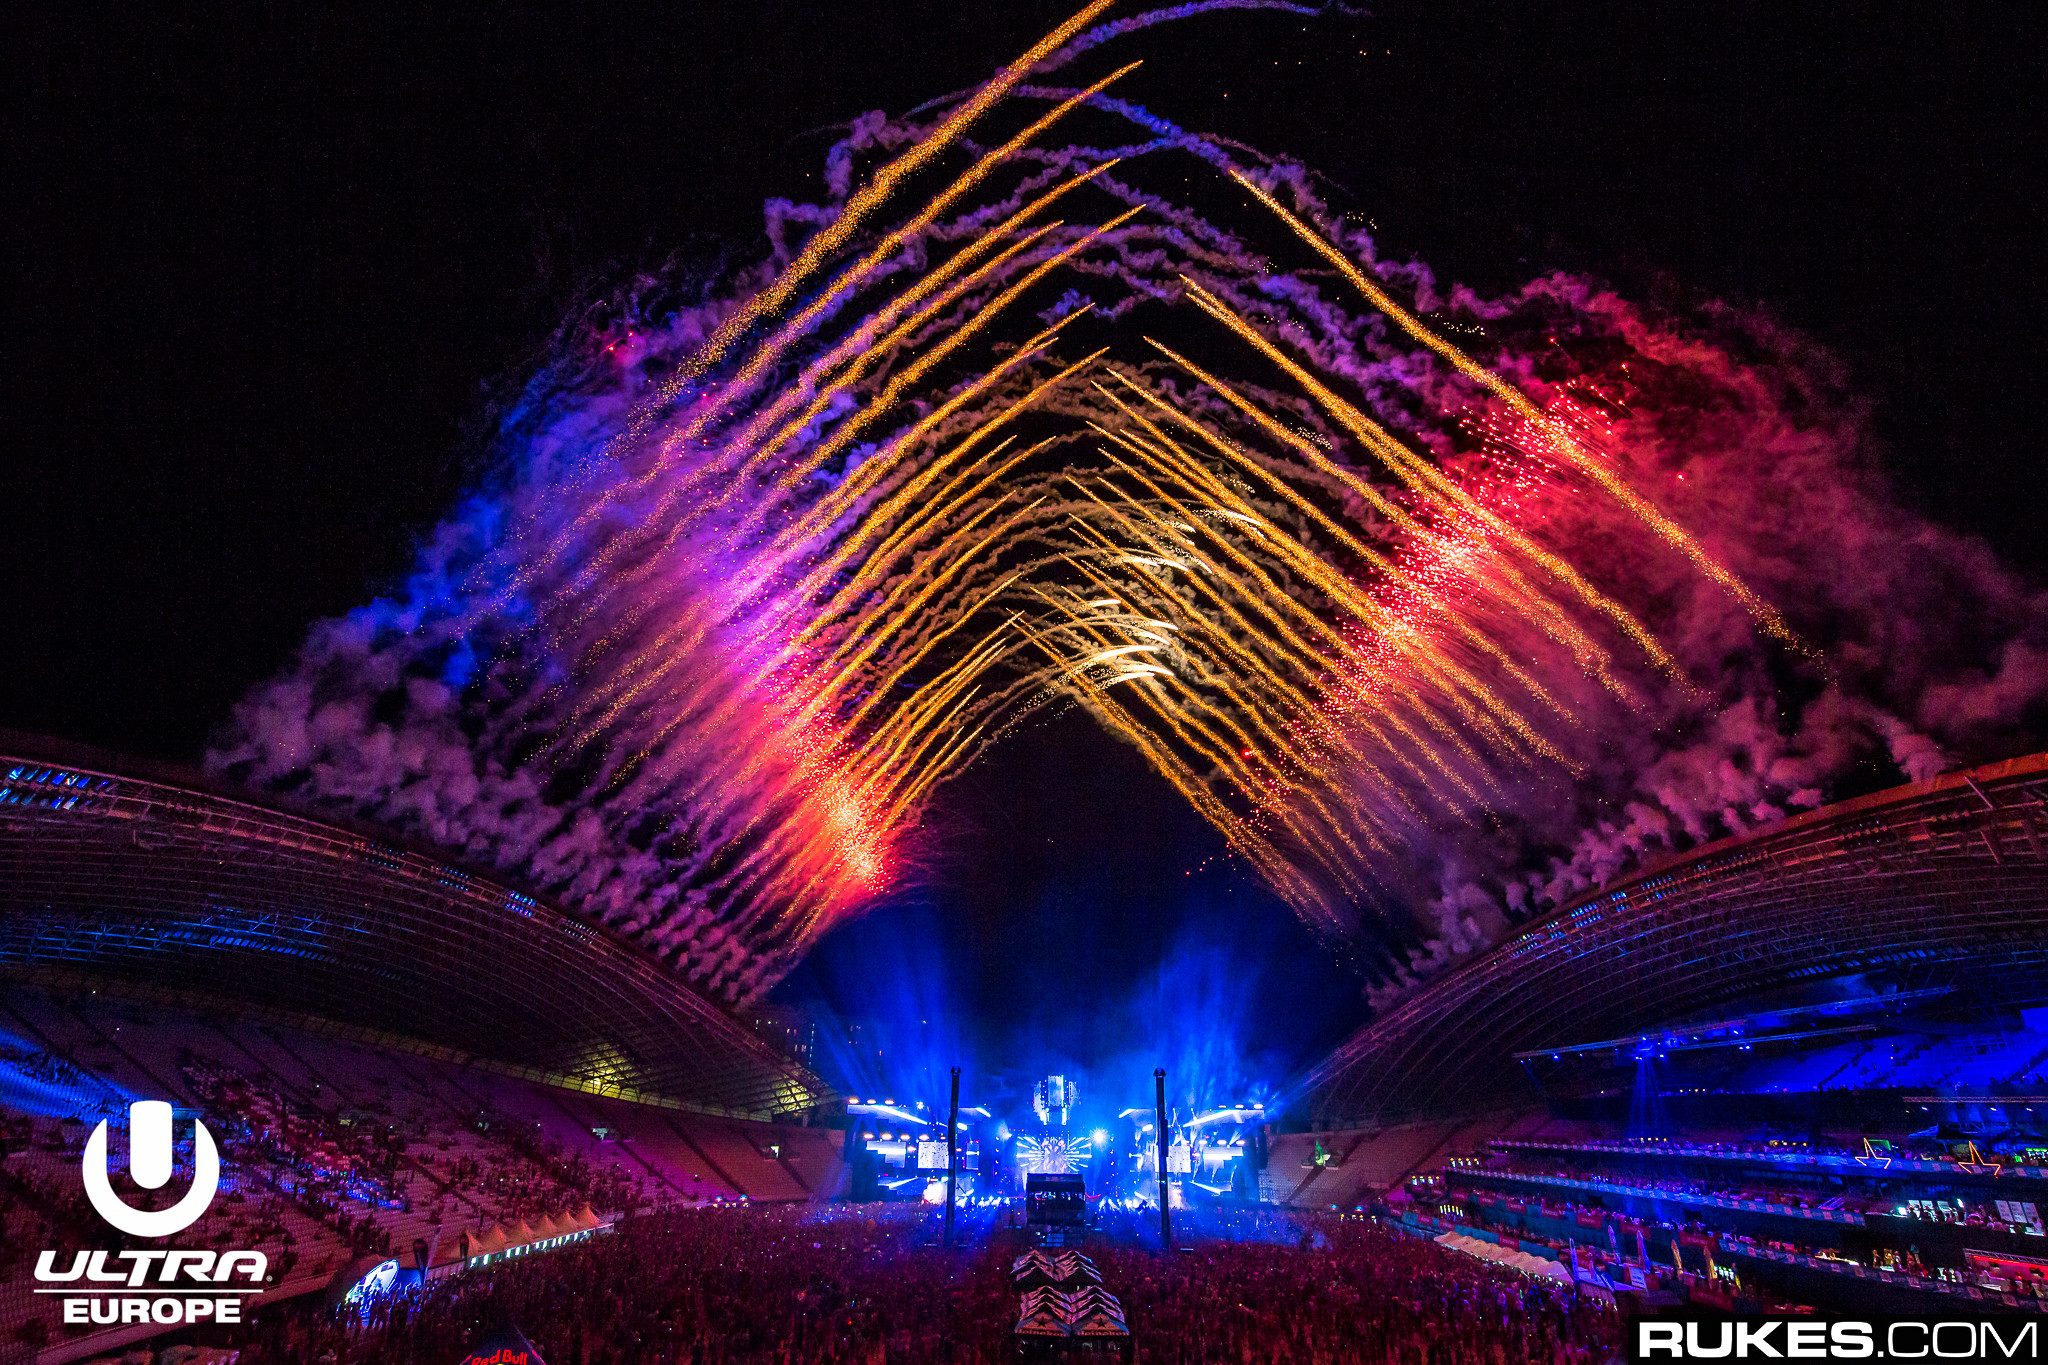 Download Ultra Music Festival Wallpaper Hd Gallery: 2 Ultra Music Festival Fondos De Pantalla HD